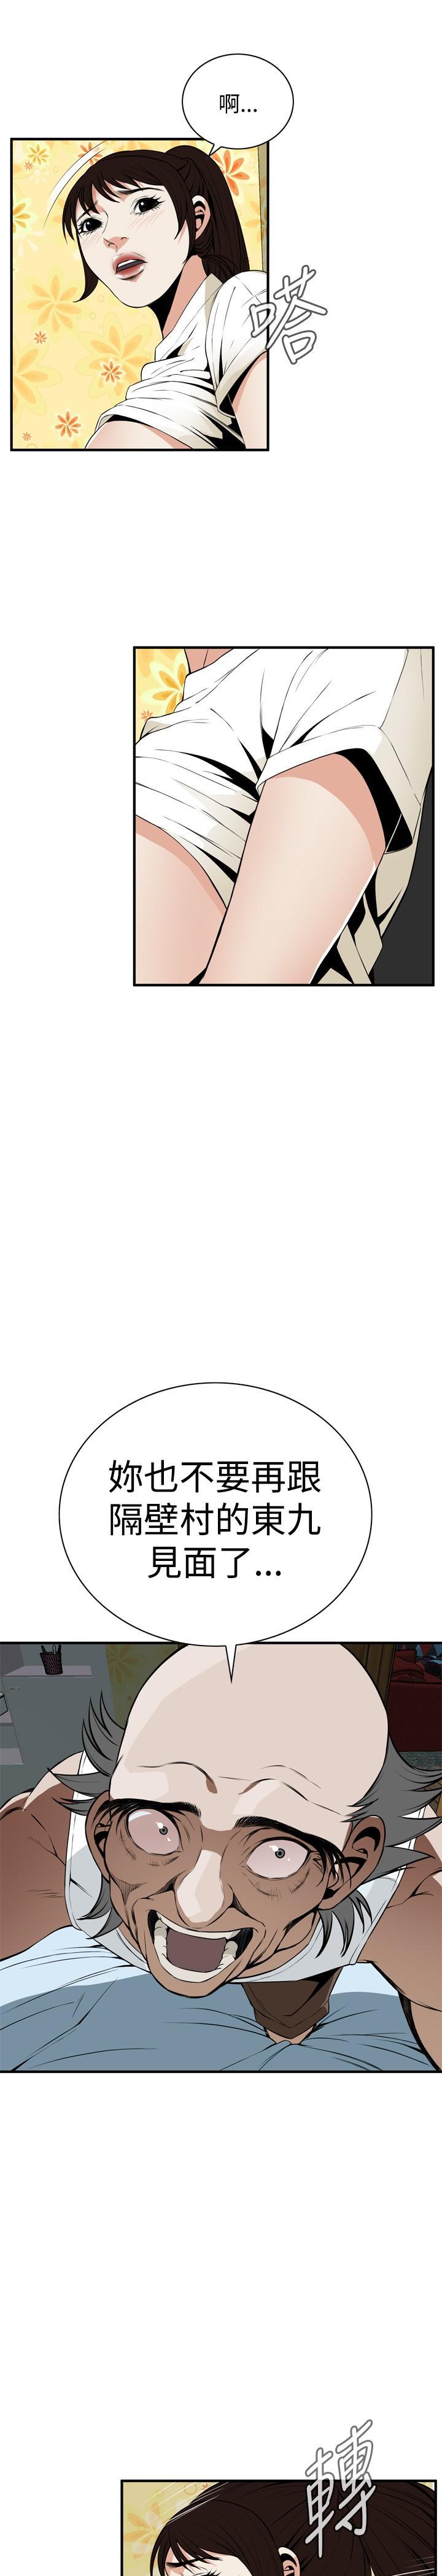 Take a Peek 偷窥 Ch.39~55 [Chinese]中文 8